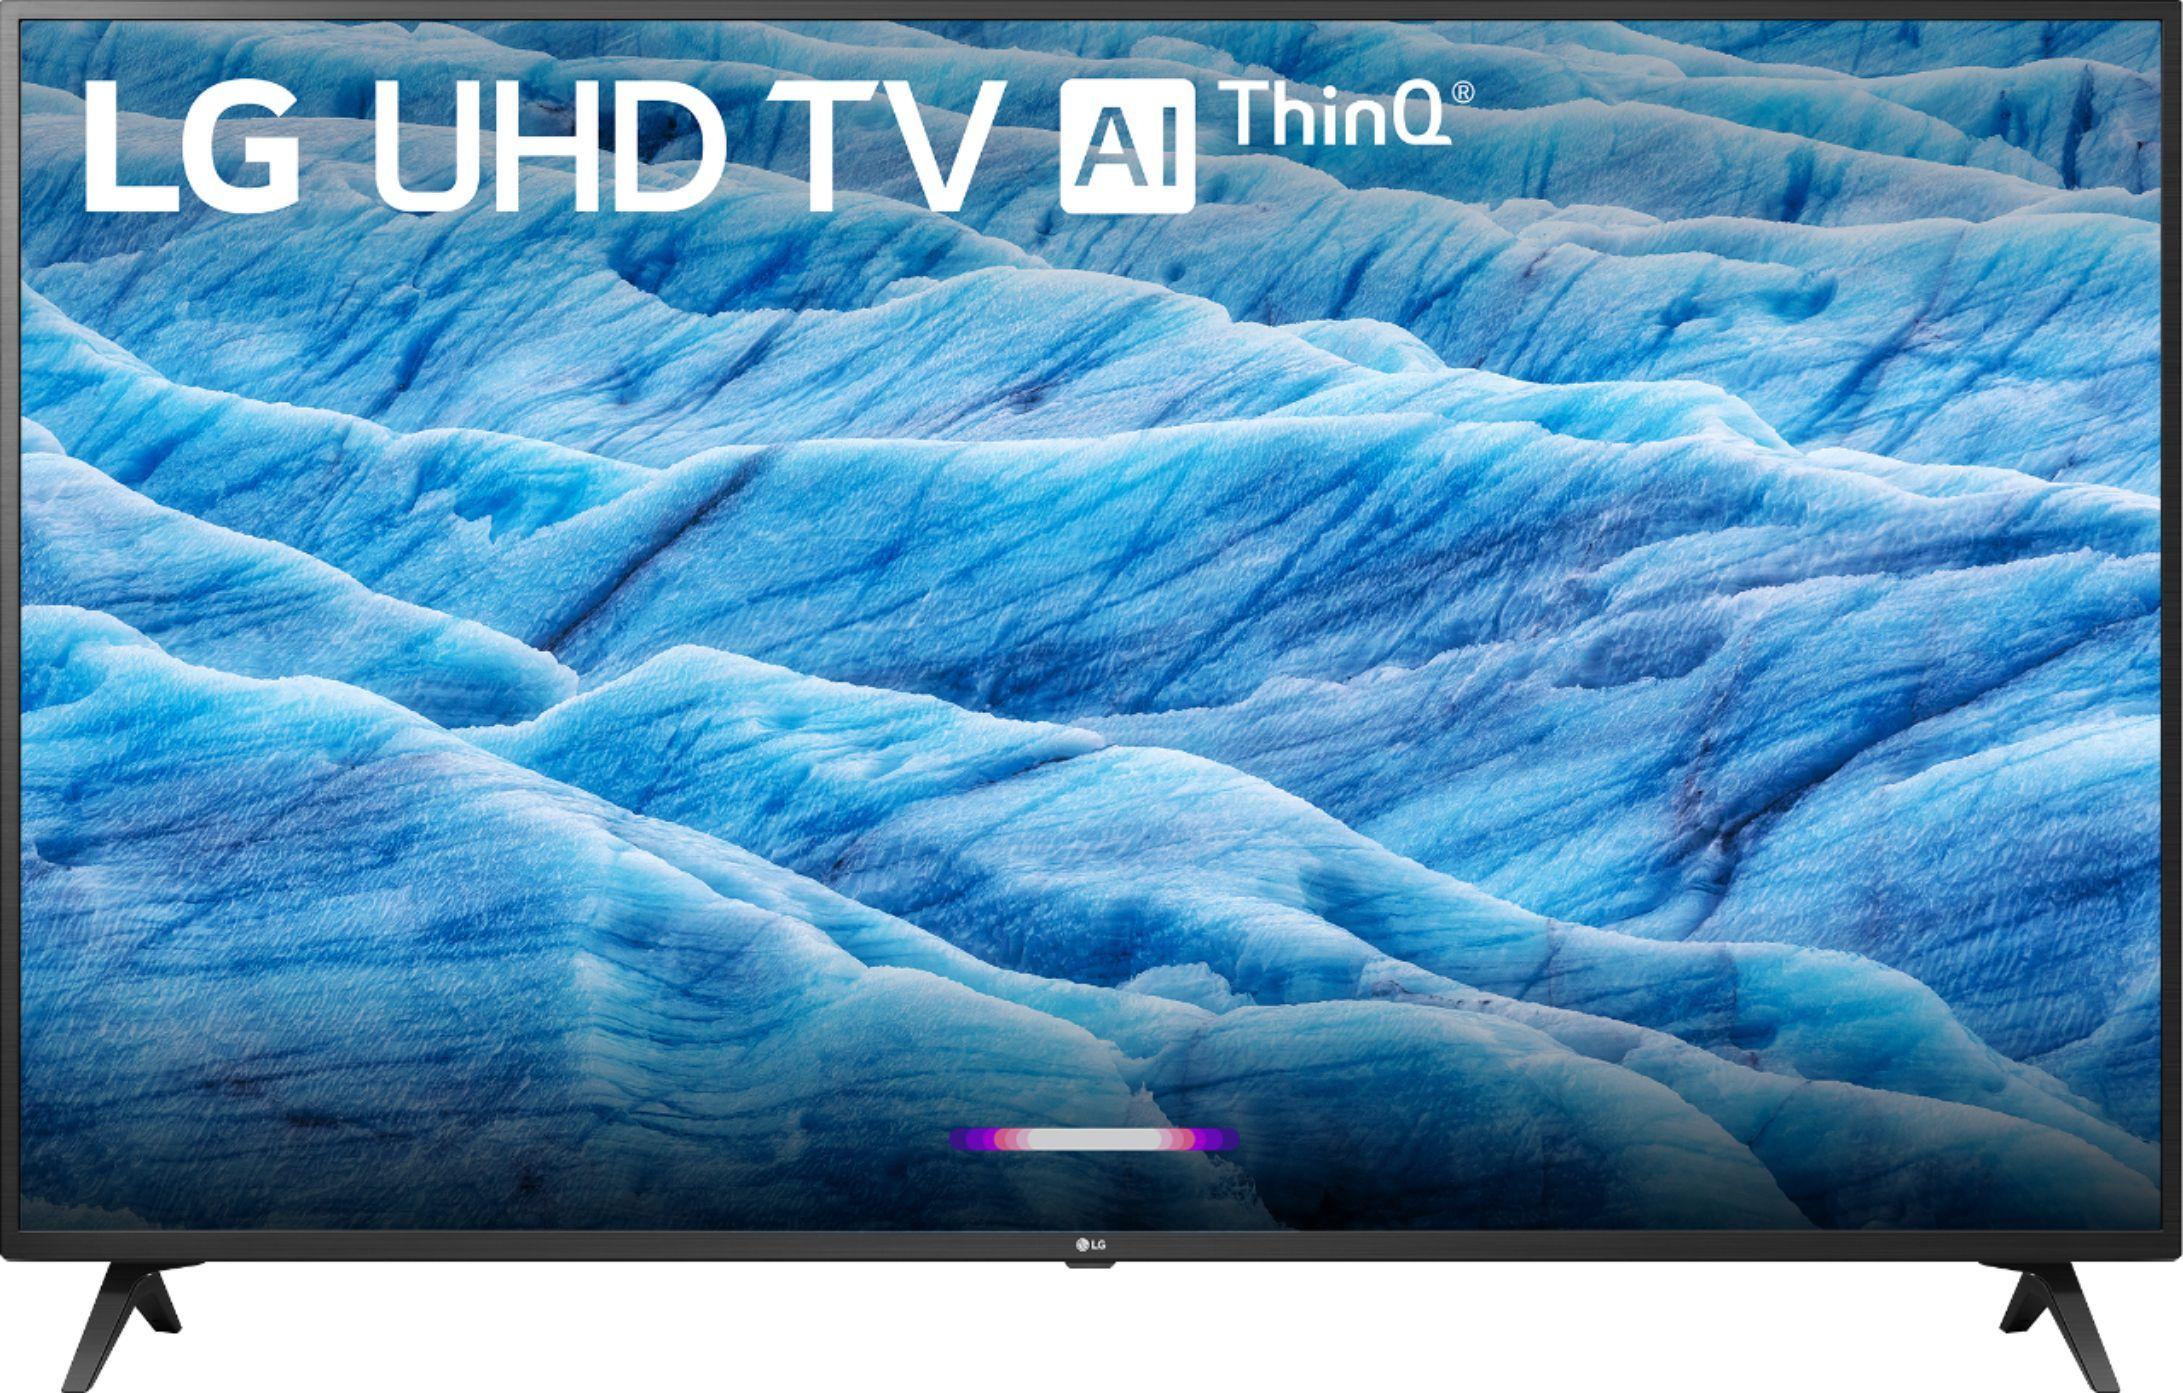 Lg 65 Class Led Um7300pua Series 2160p Smart 4k Uhd Tv With Hdr In 2020 Uhd Tv Led Tv Smart Tv